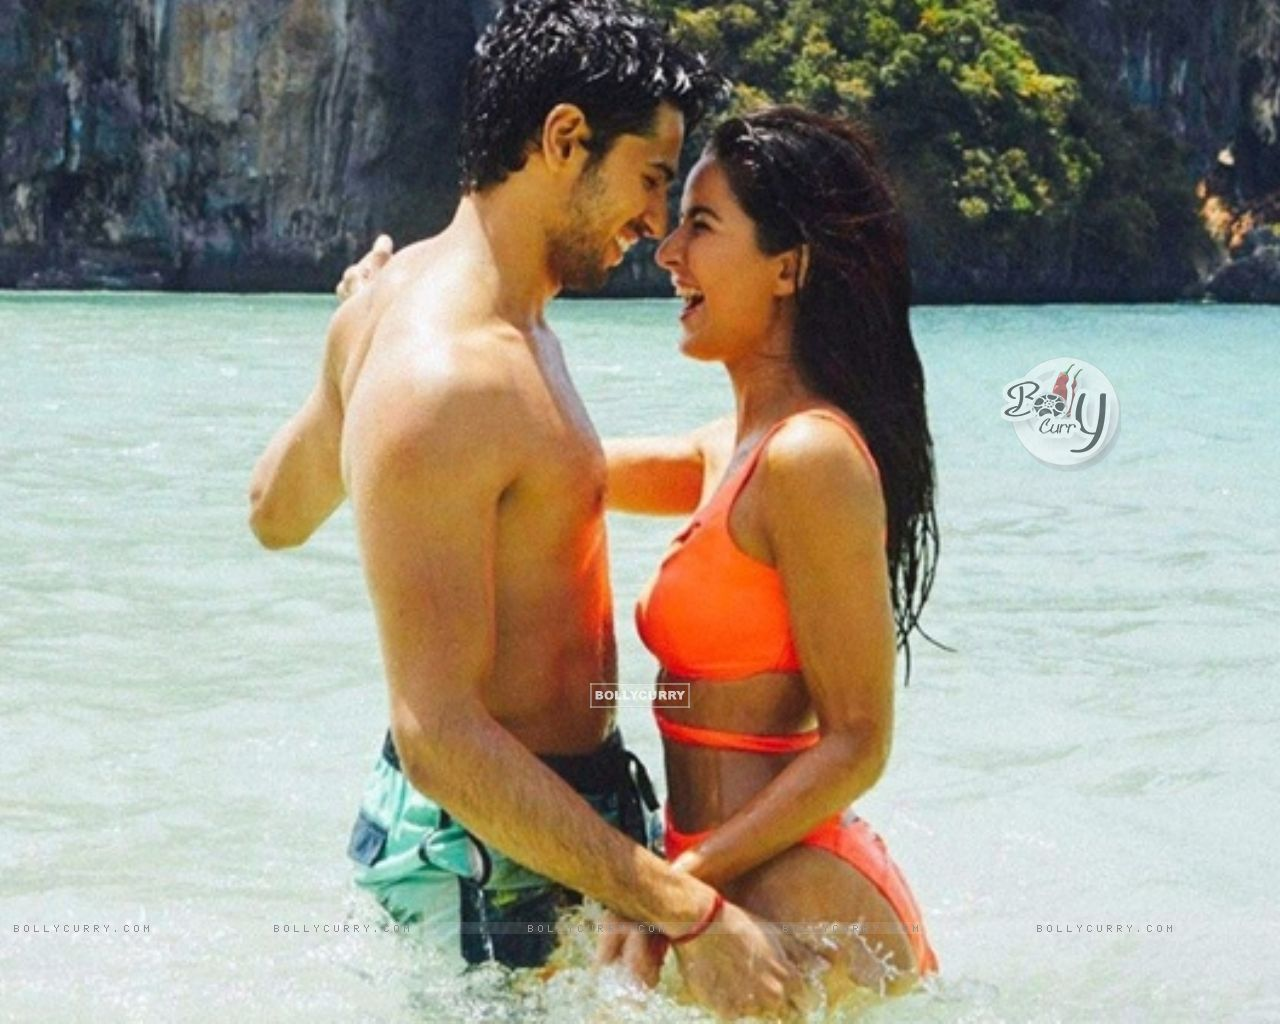 Still from 'Baar Baar Dekho' starring Katrina Kaif and Sidharth Malhotra (414550) size:1280x1024